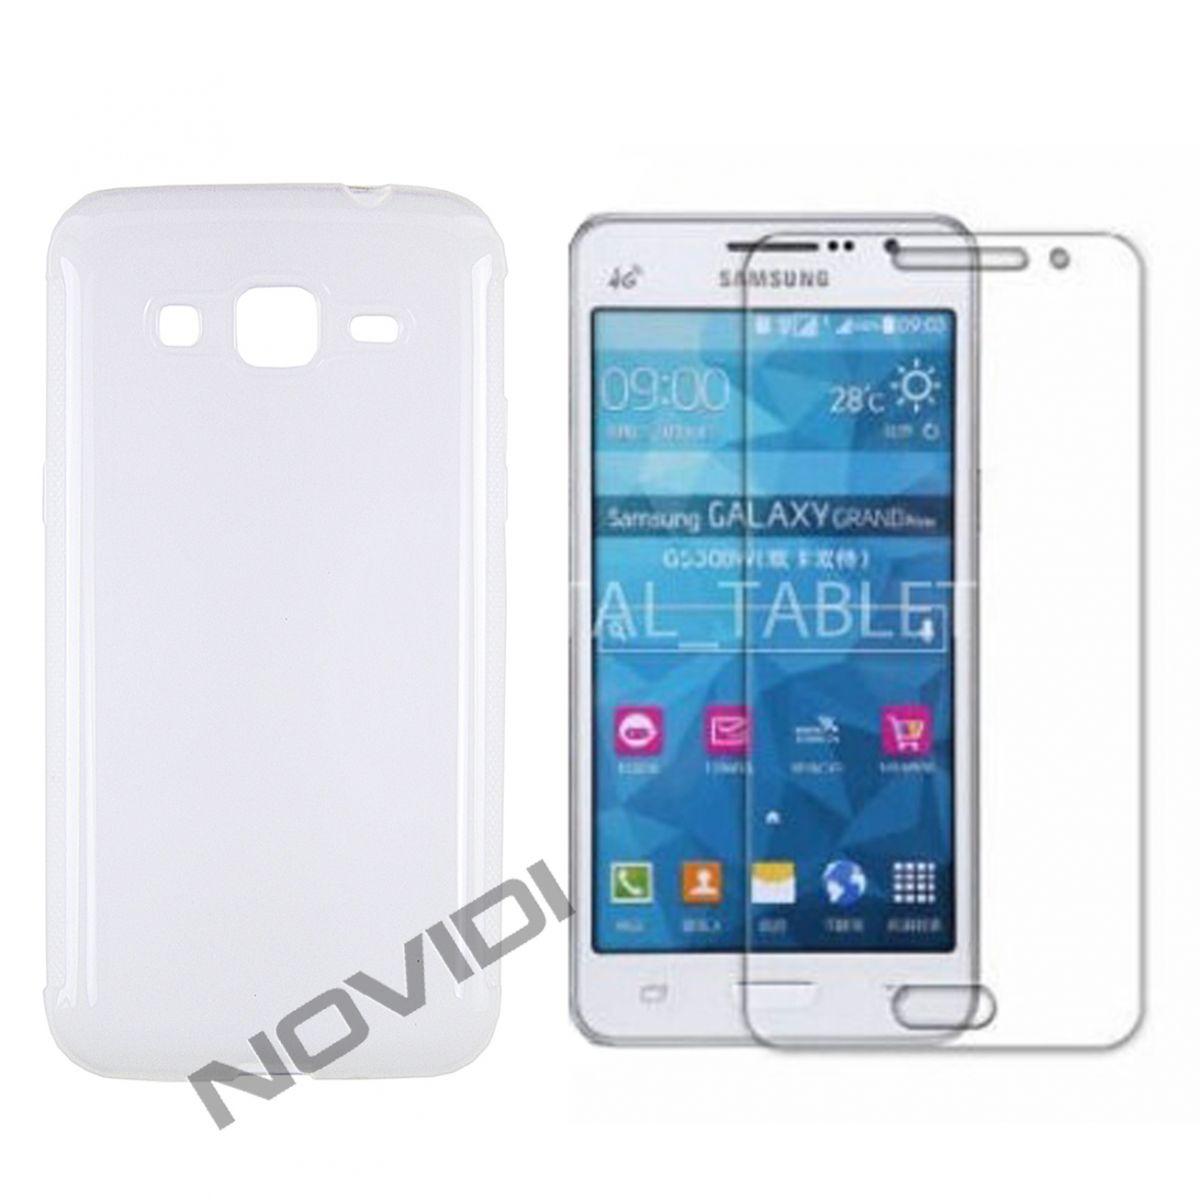 Samsung i7500 galaxy firmware i7500dxif1 generic asia